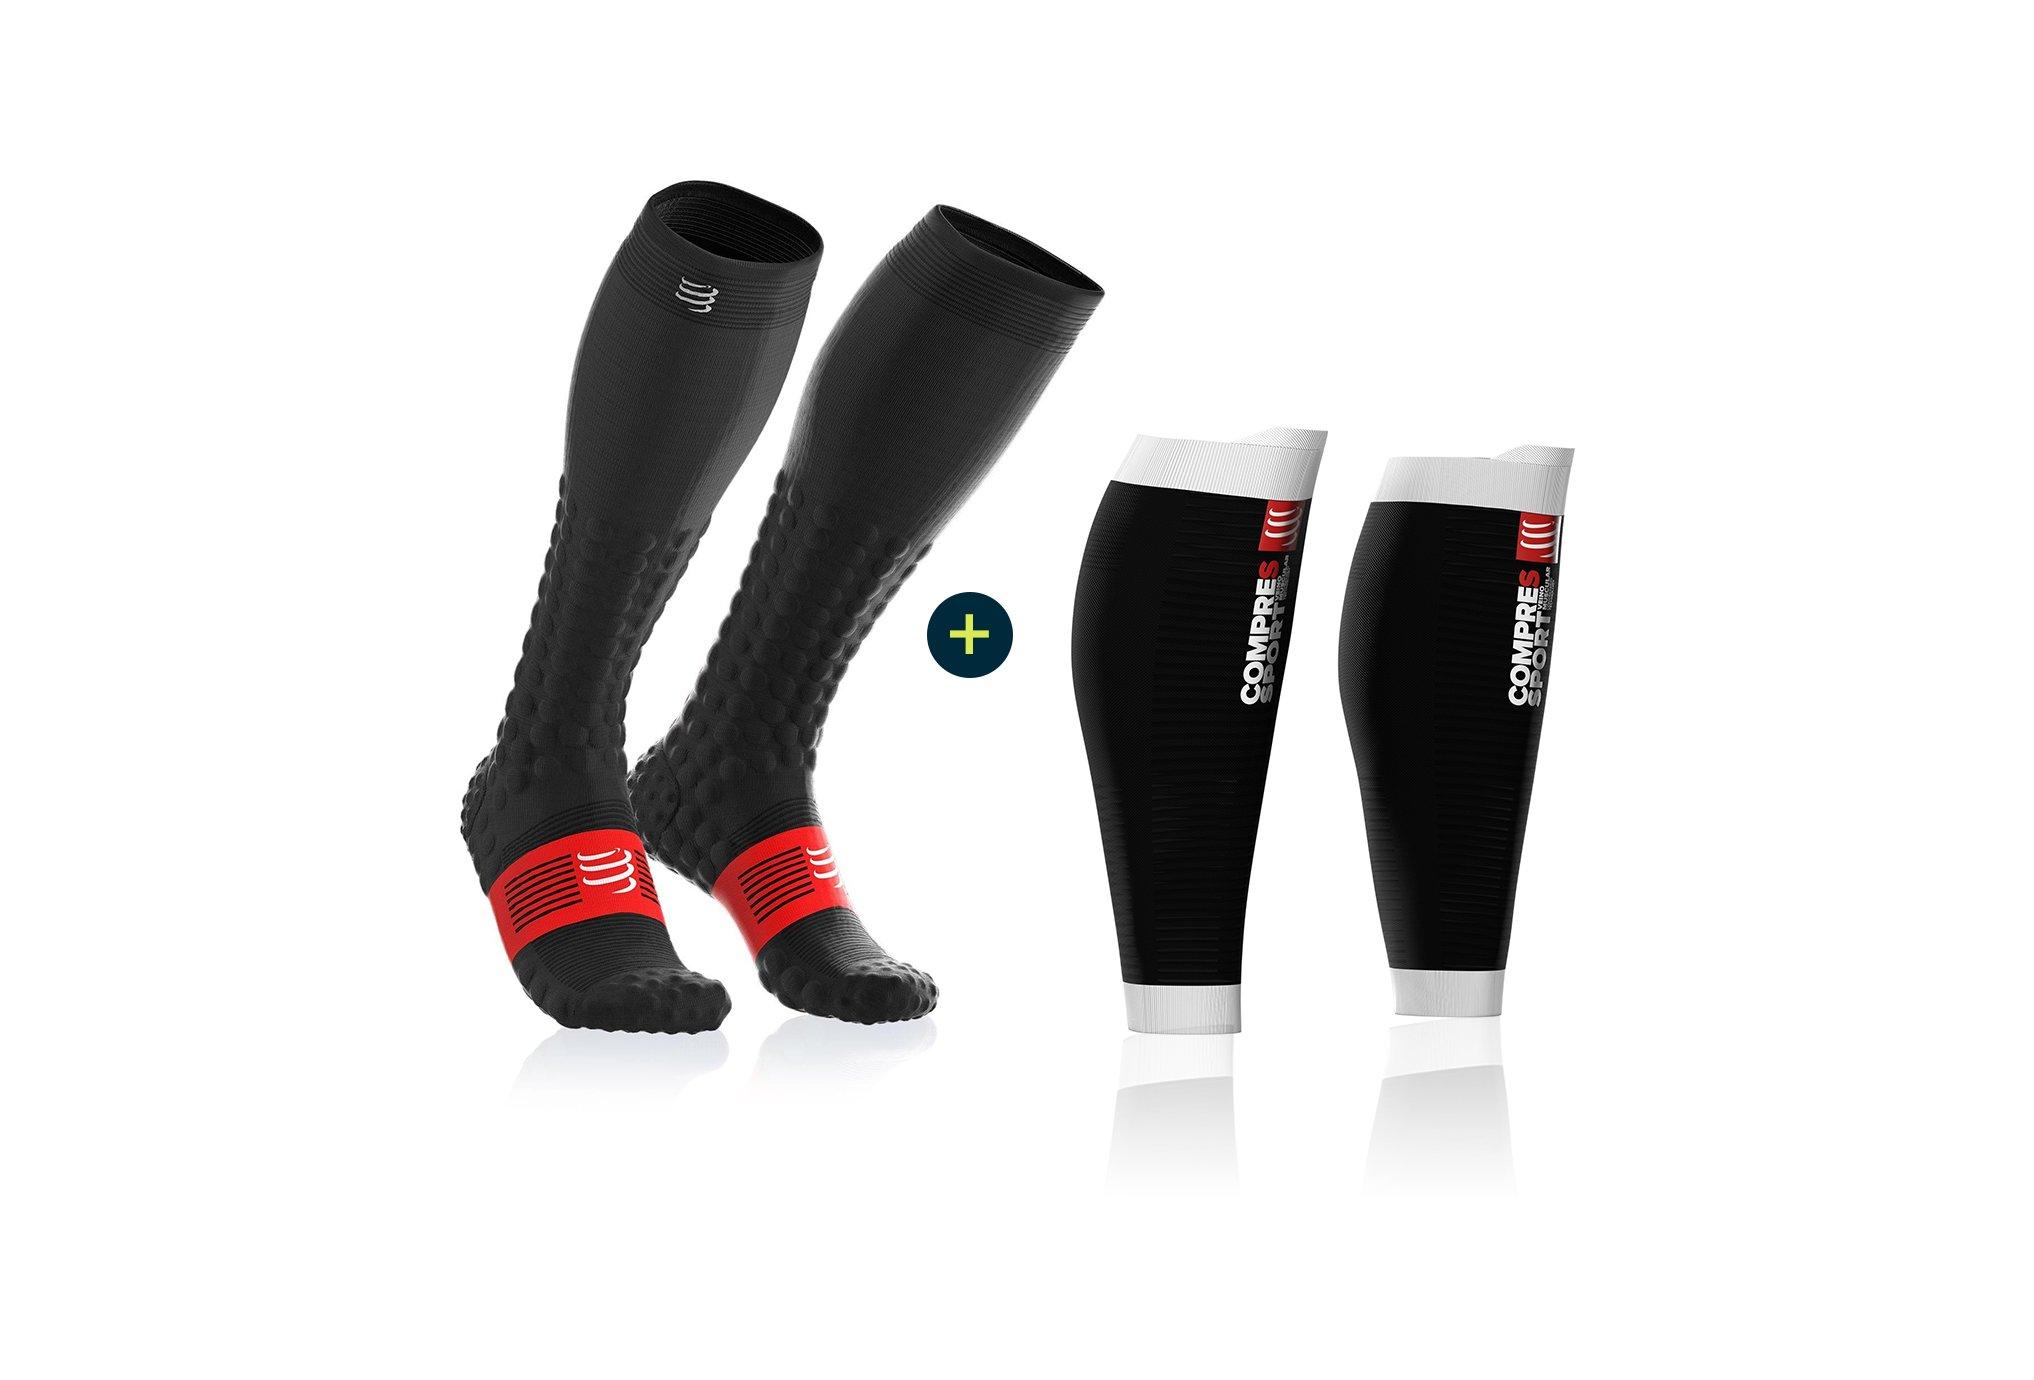 Compressport Pack Full Socks Detox Recovery + R2 Oxygen Manchons